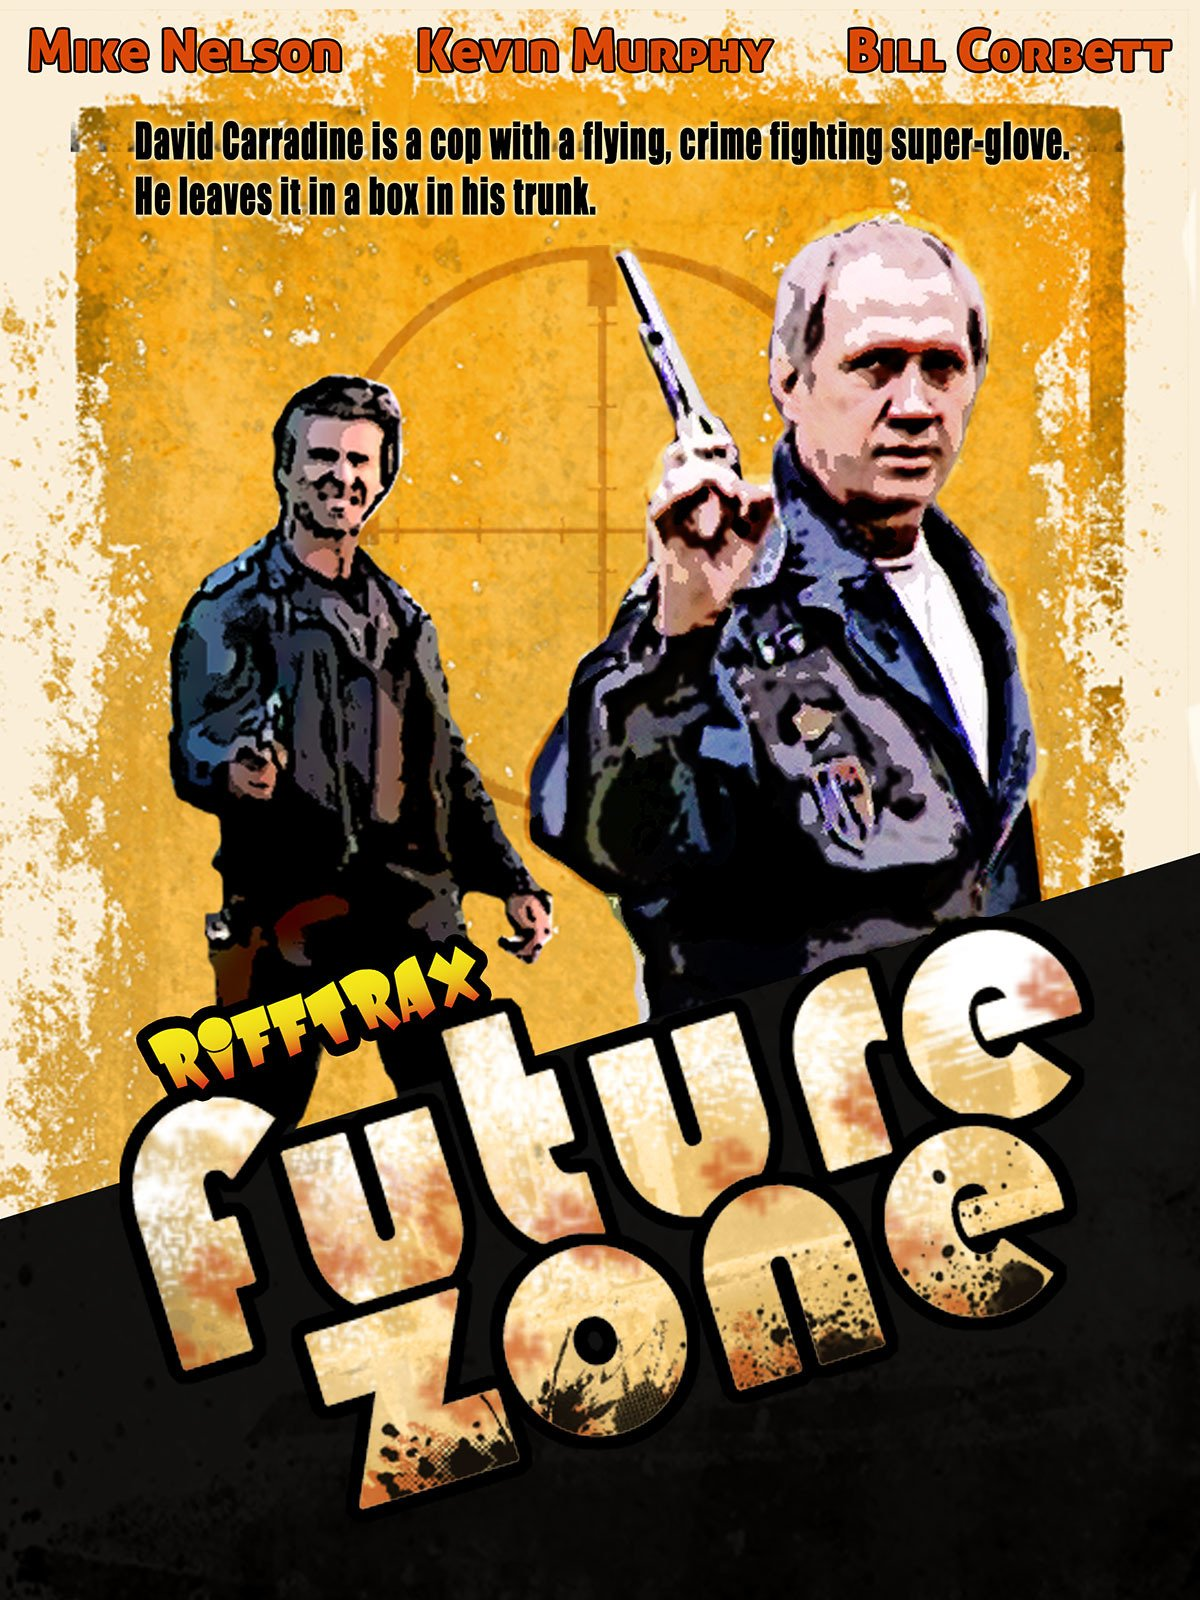 RiffTrax: Future Zone